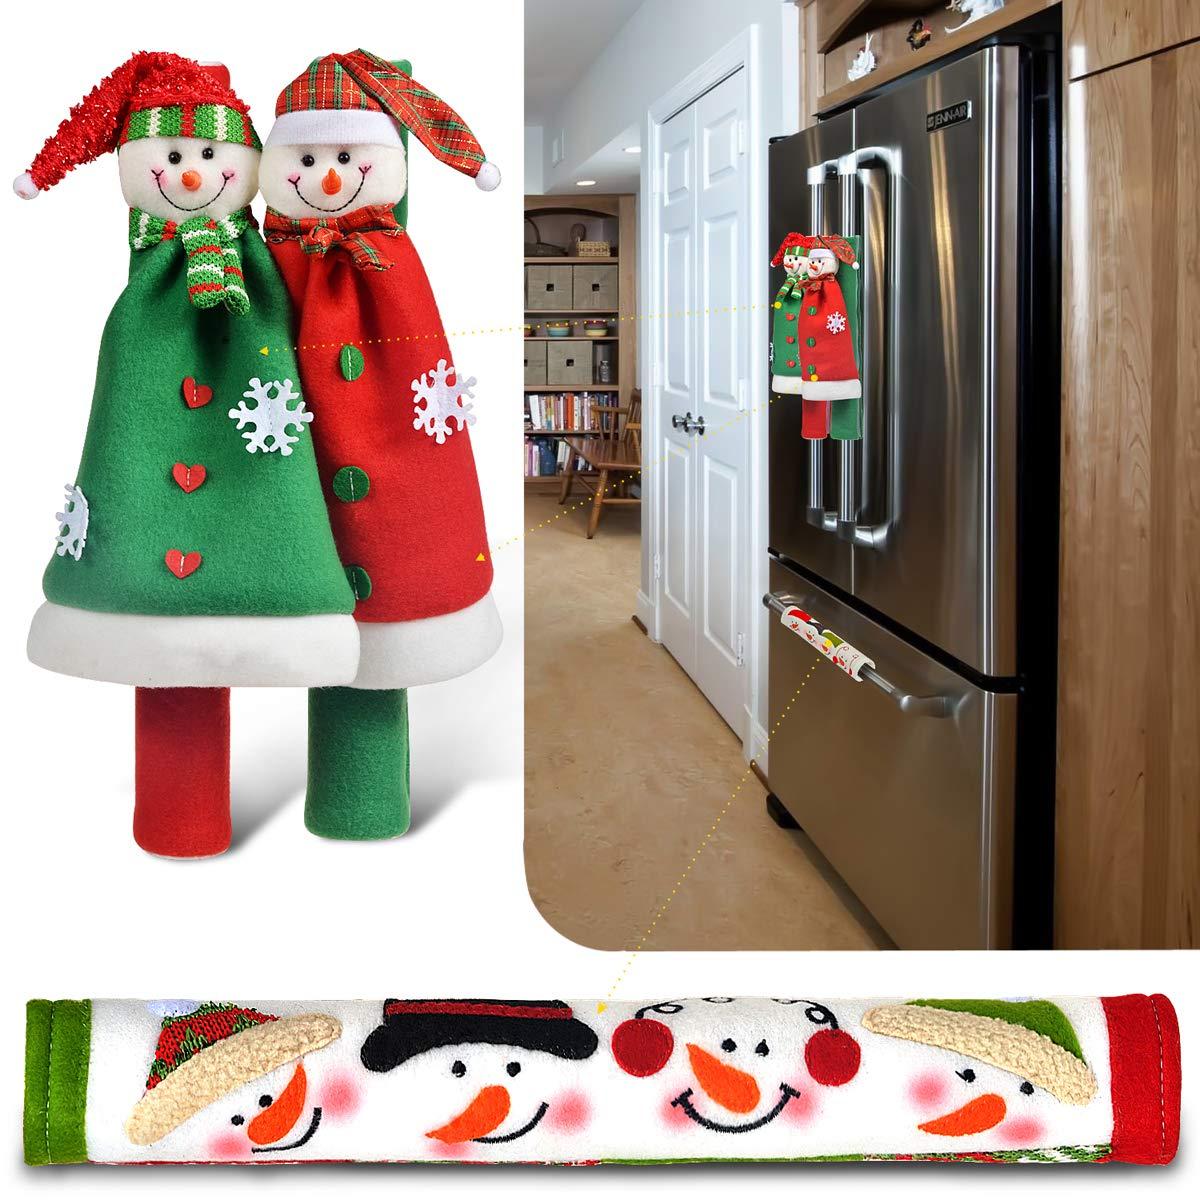 OUGAR8 Adorable Snowman Refrigerator Handle Covers Set | Cute &Practical Fridge Door Covers| Protective Kitchen Appliance Covers |Perfect Christmas Decorations Idea (4-Cloak)